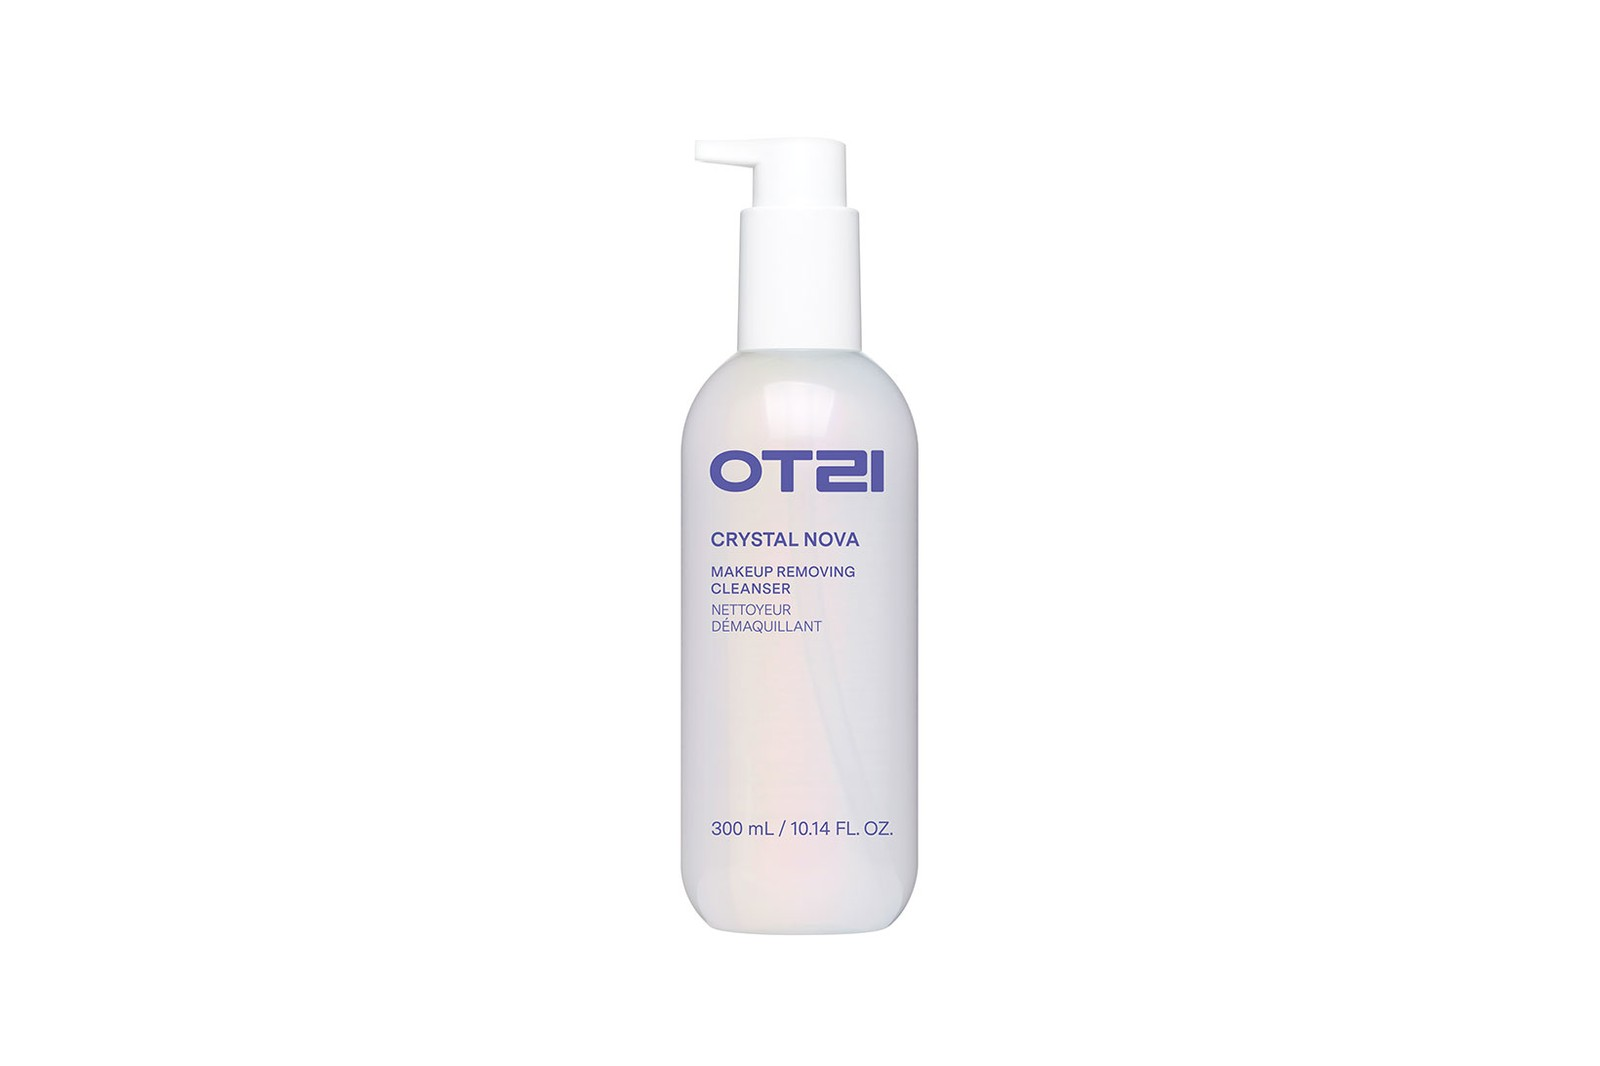 otzi mbx sephora k beauty skincare cleanser moisturizer serums masks